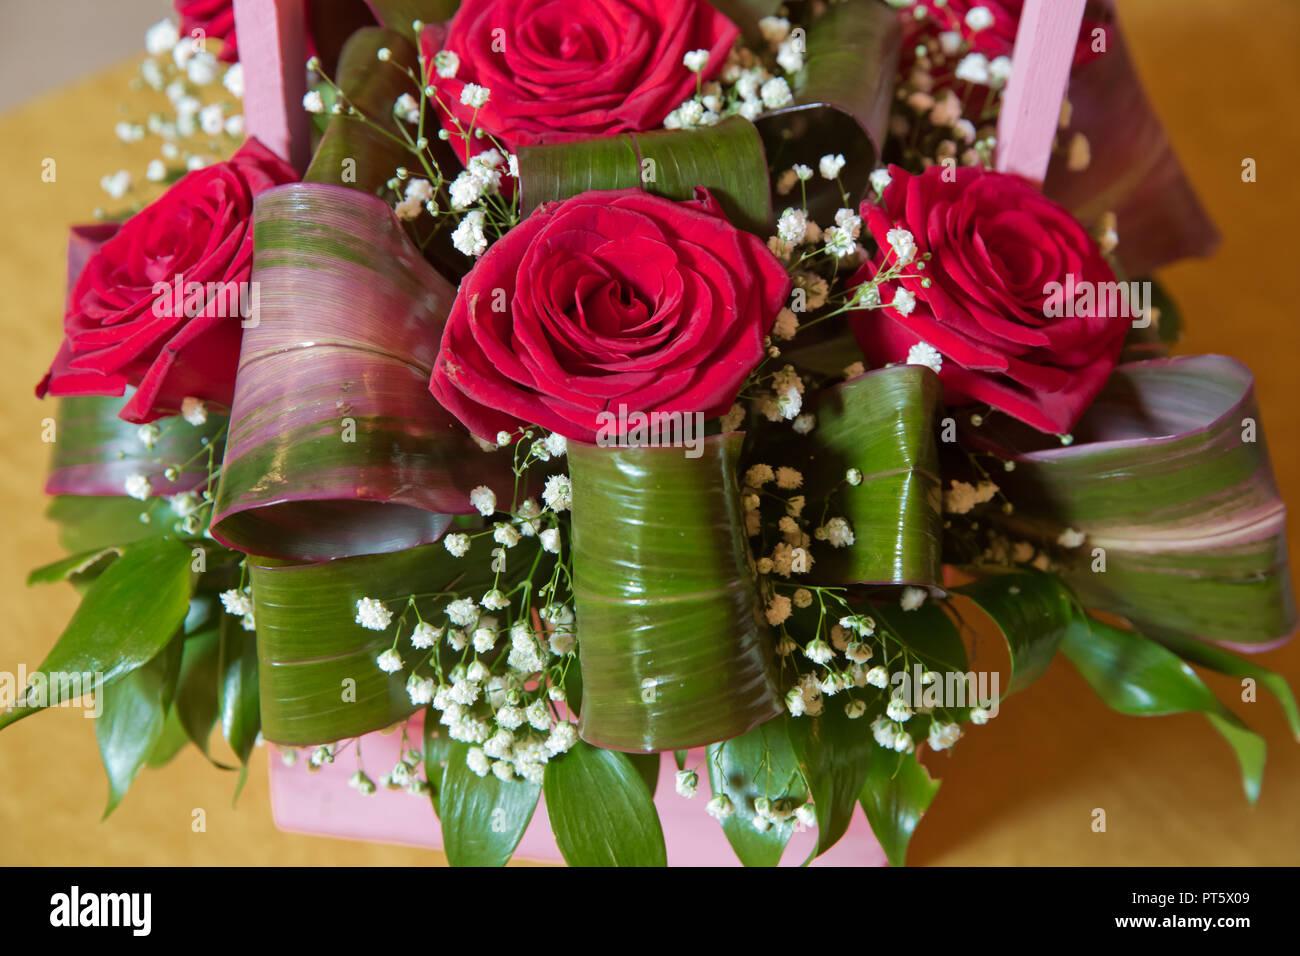 Mazzo Di Fiori Enorme.Bouquet Di Rose Rosse Di Close Up Bouquet Di Rose Fiori Di Close